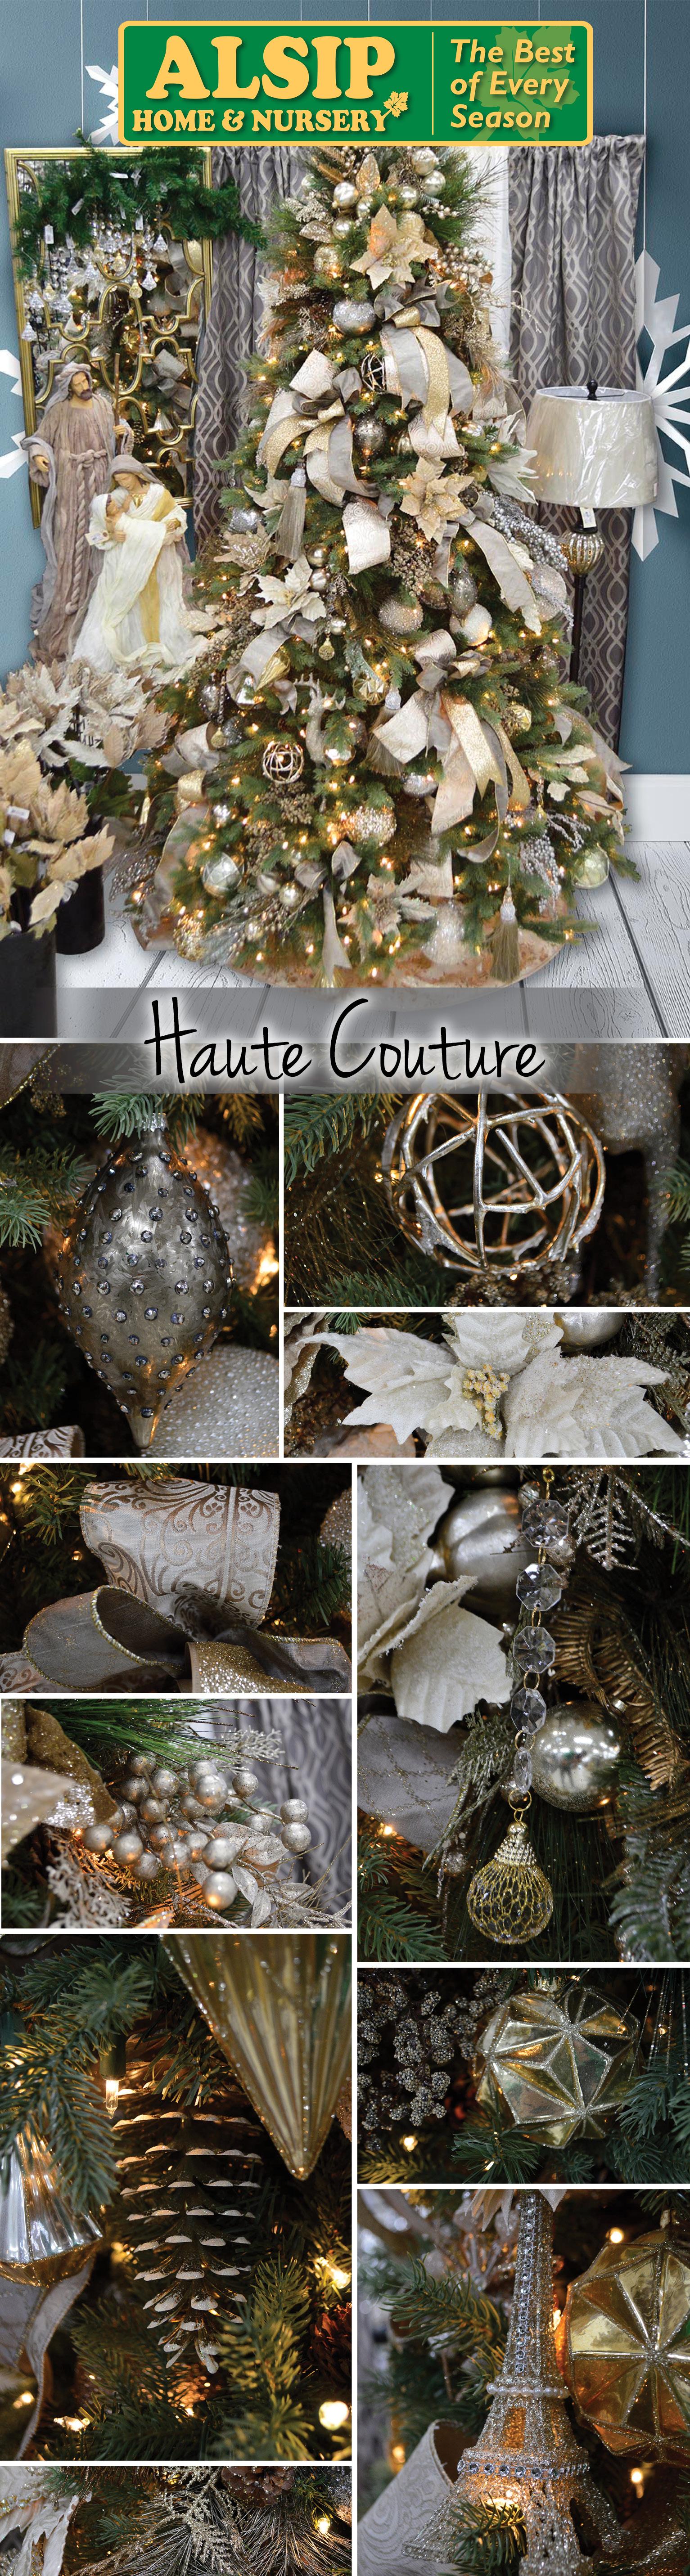 Haute Couture 2017 Christmas tree design, Christmas tree